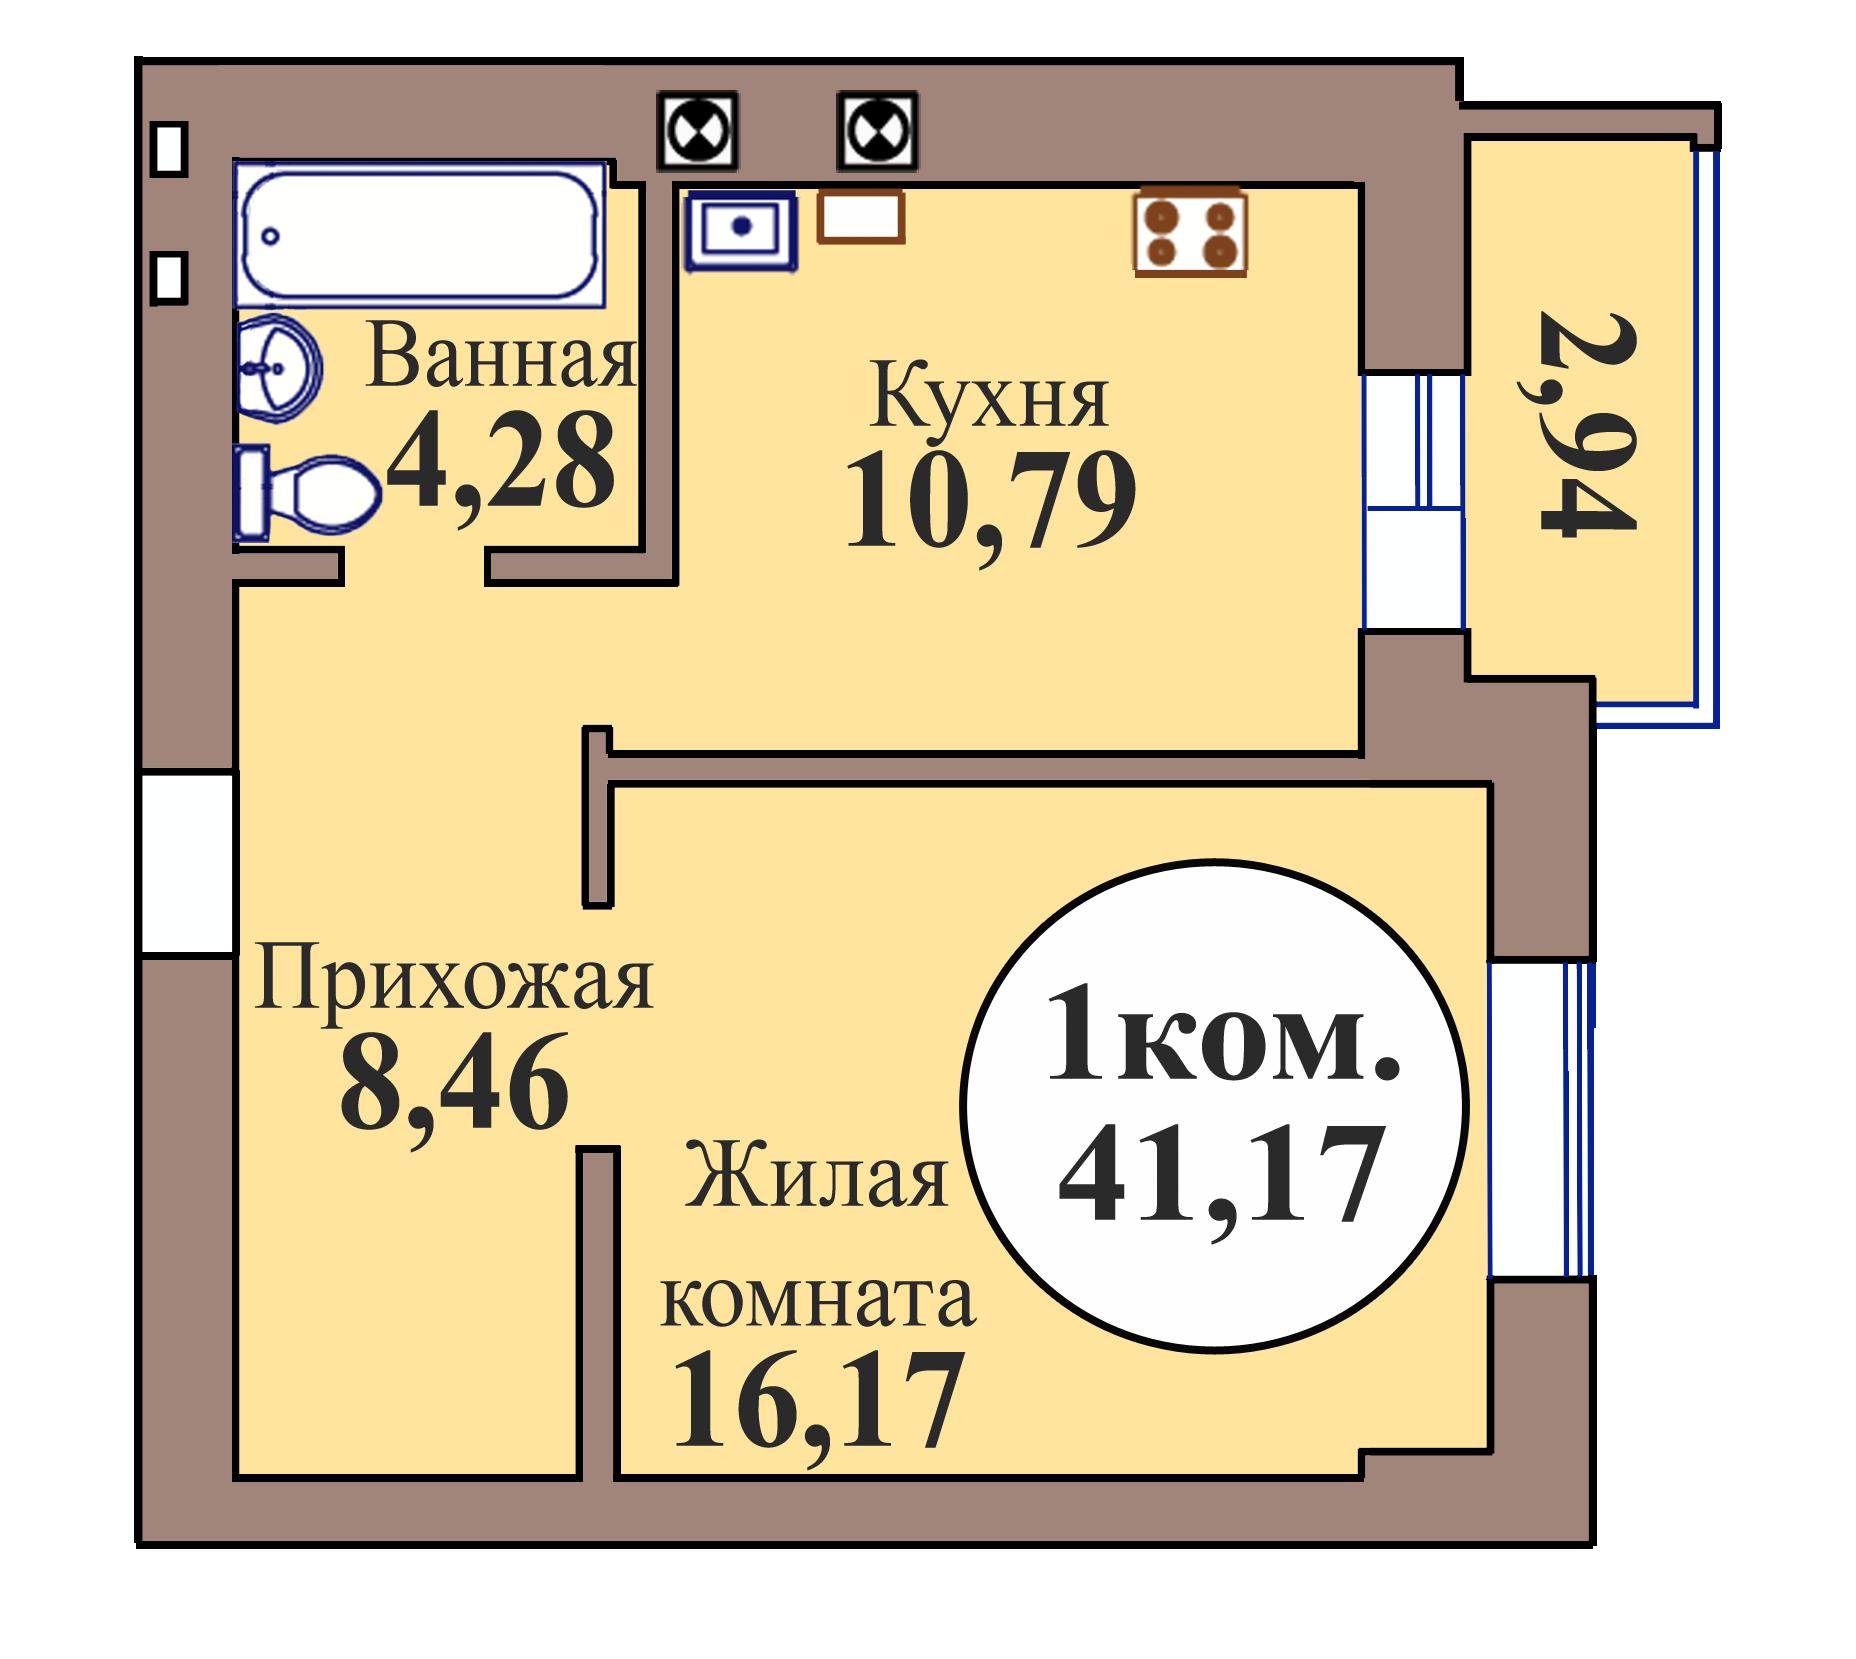 1-комн. кв. по пер. Калининградский, 5 кв. 136 в Калининграде